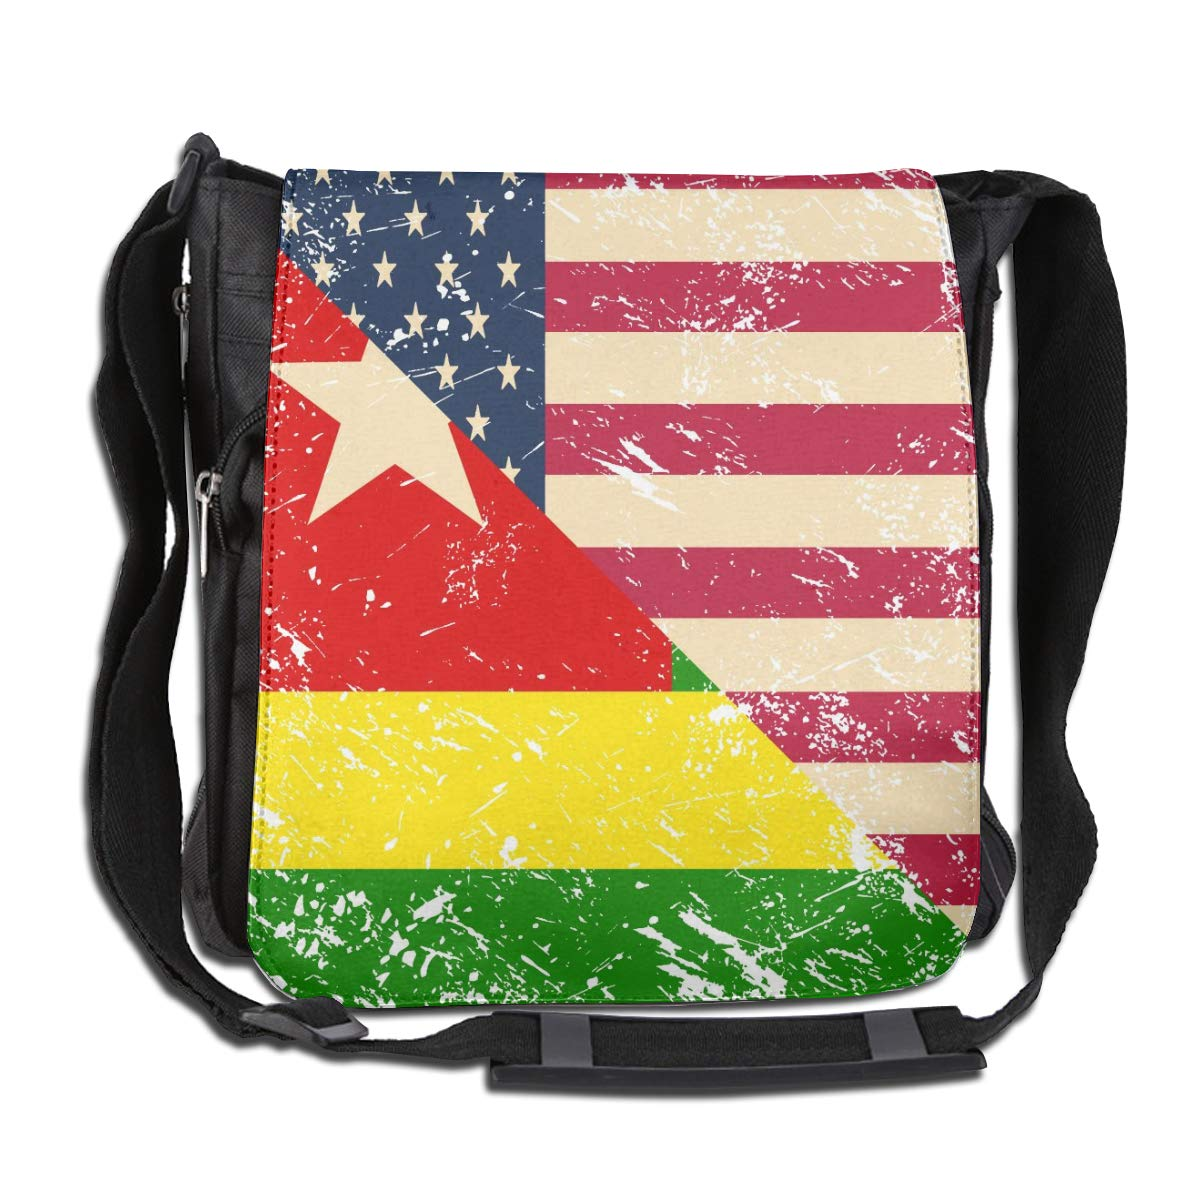 Unisex Durable Satchel Messenger Bags American And Togo Retro Flag2 Crossbody Shoulder Bag Traveling Bag For School//Work//Trips